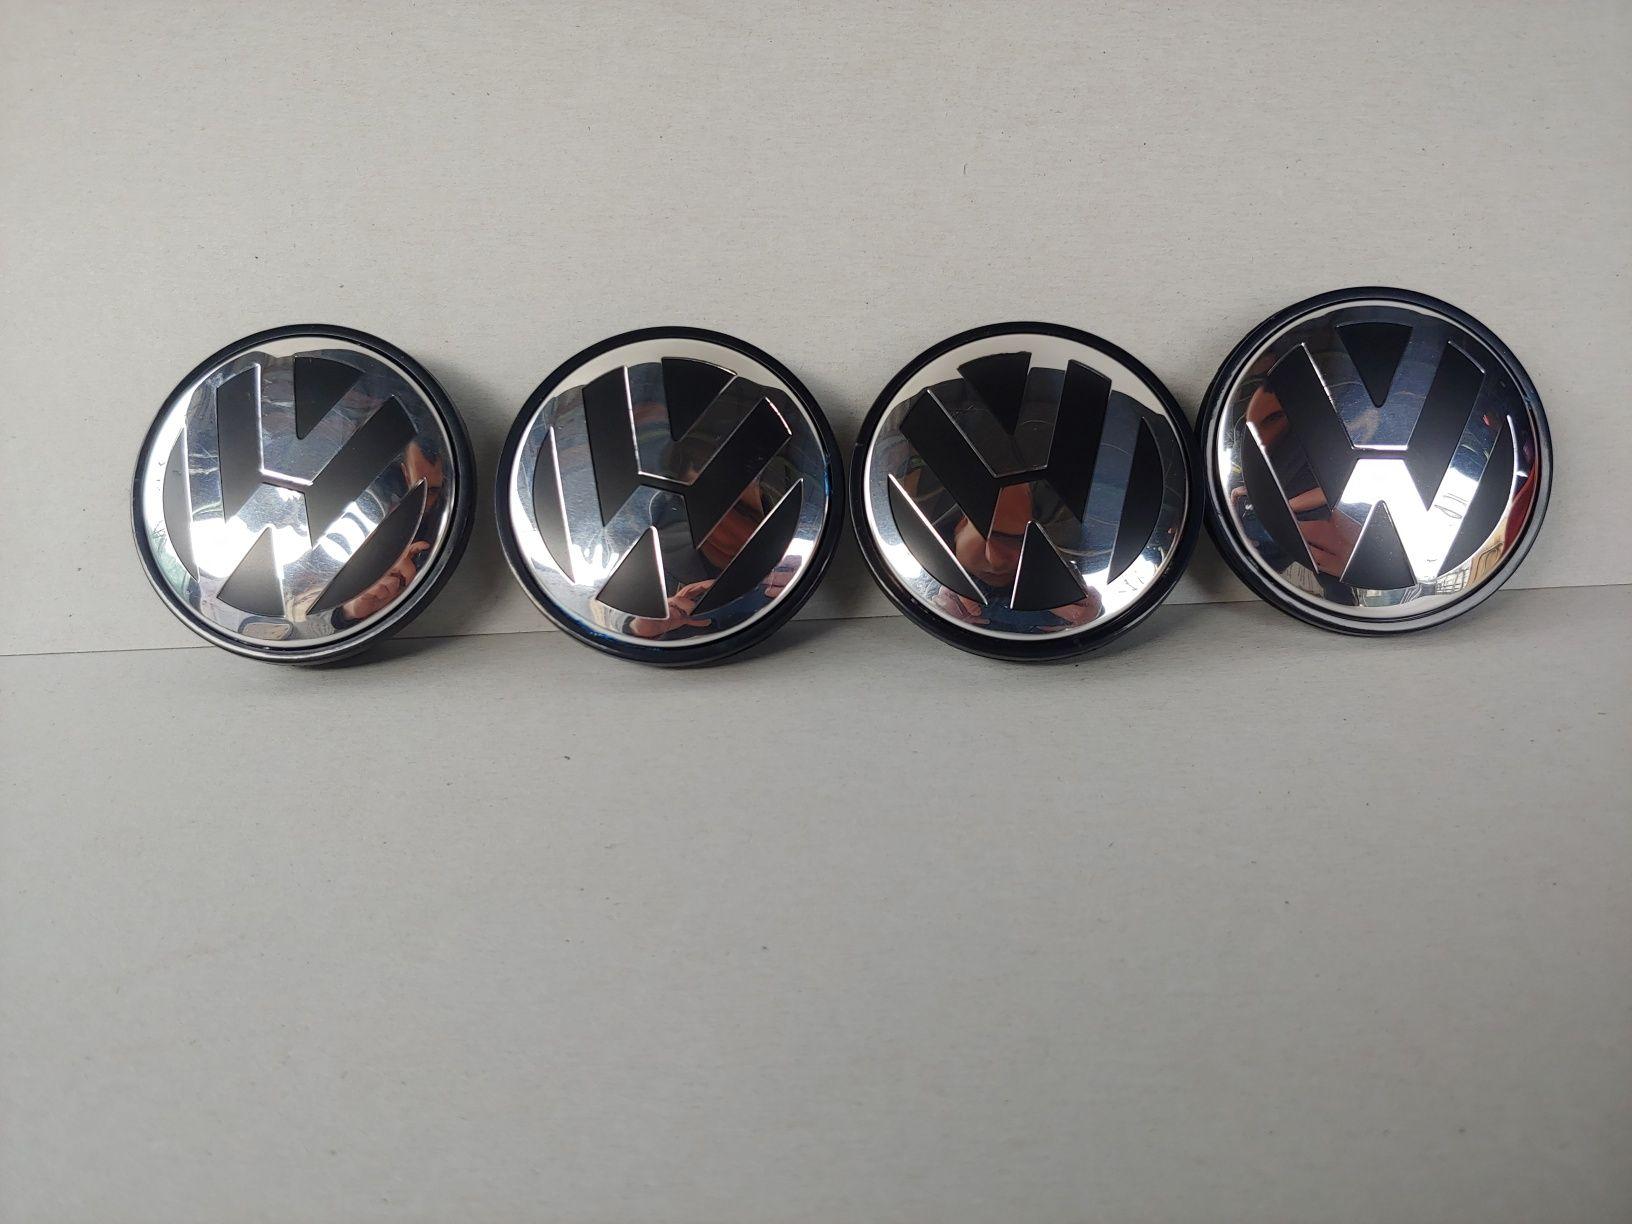 70мм Капачки за джанти за Фолксваген VW Туарег Амарок 7L6 601 149B